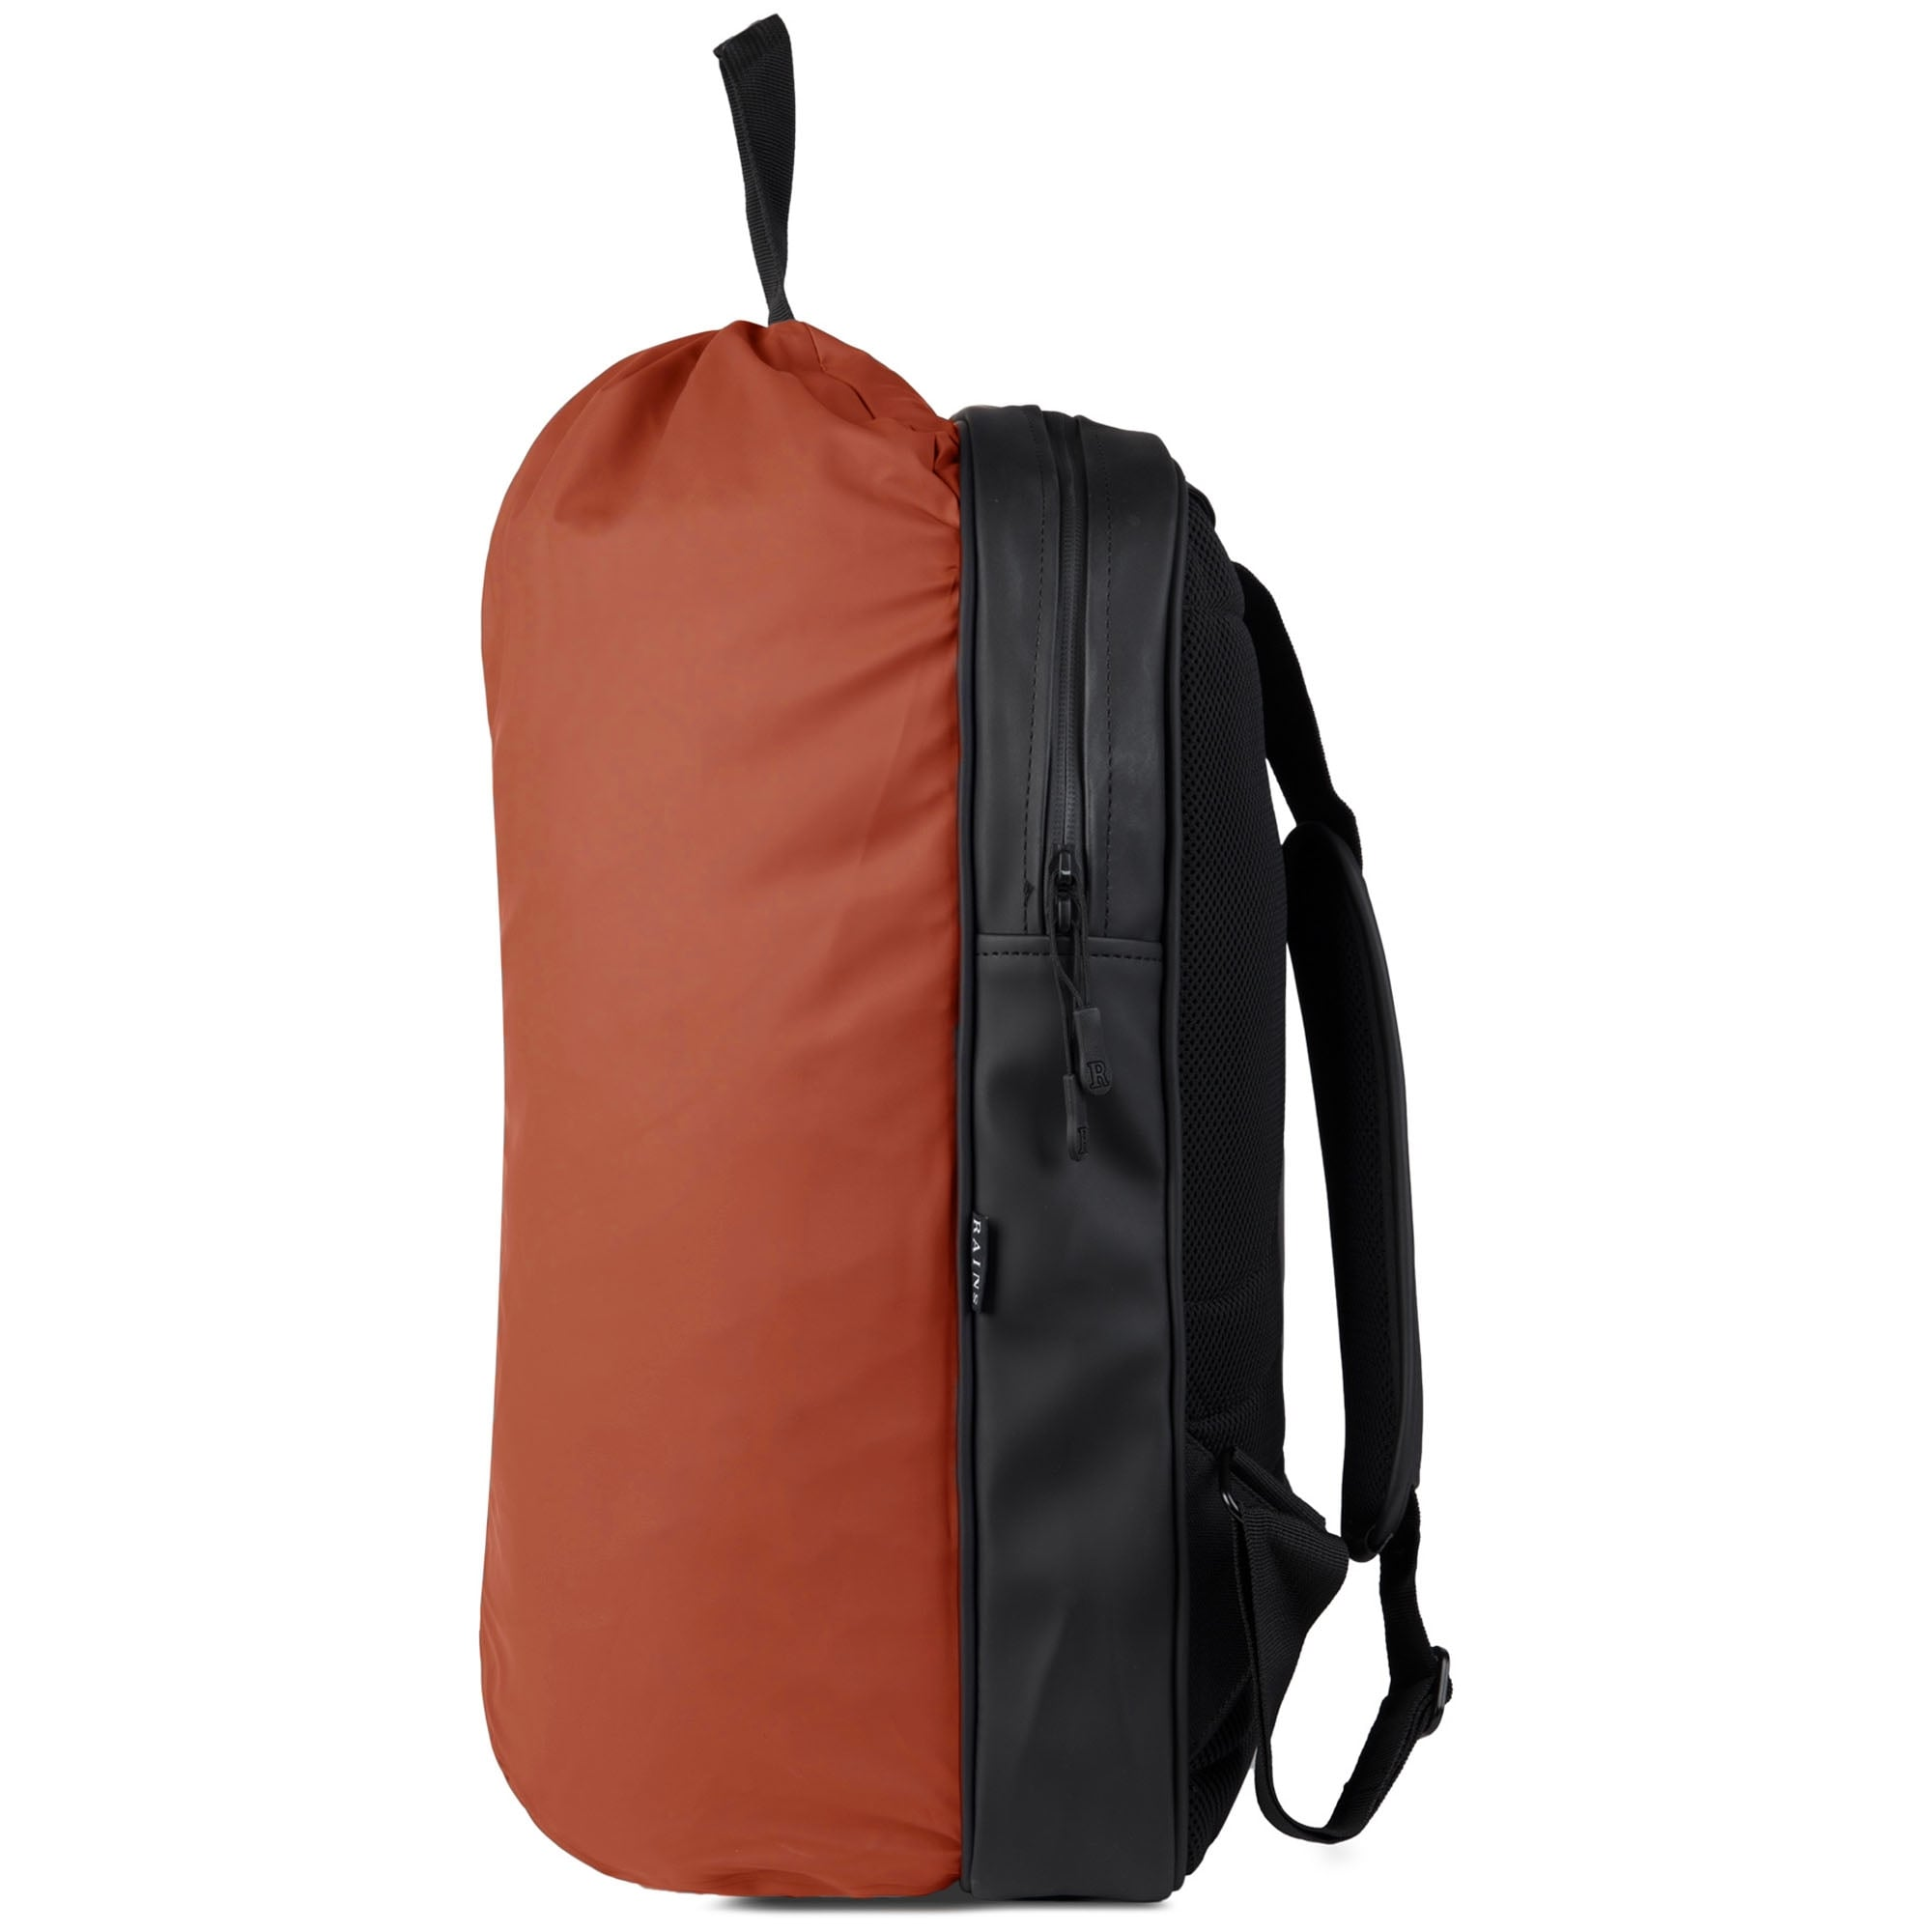 25c4e8f343e8 Rains Day Bag Rust Backpack 1223 51